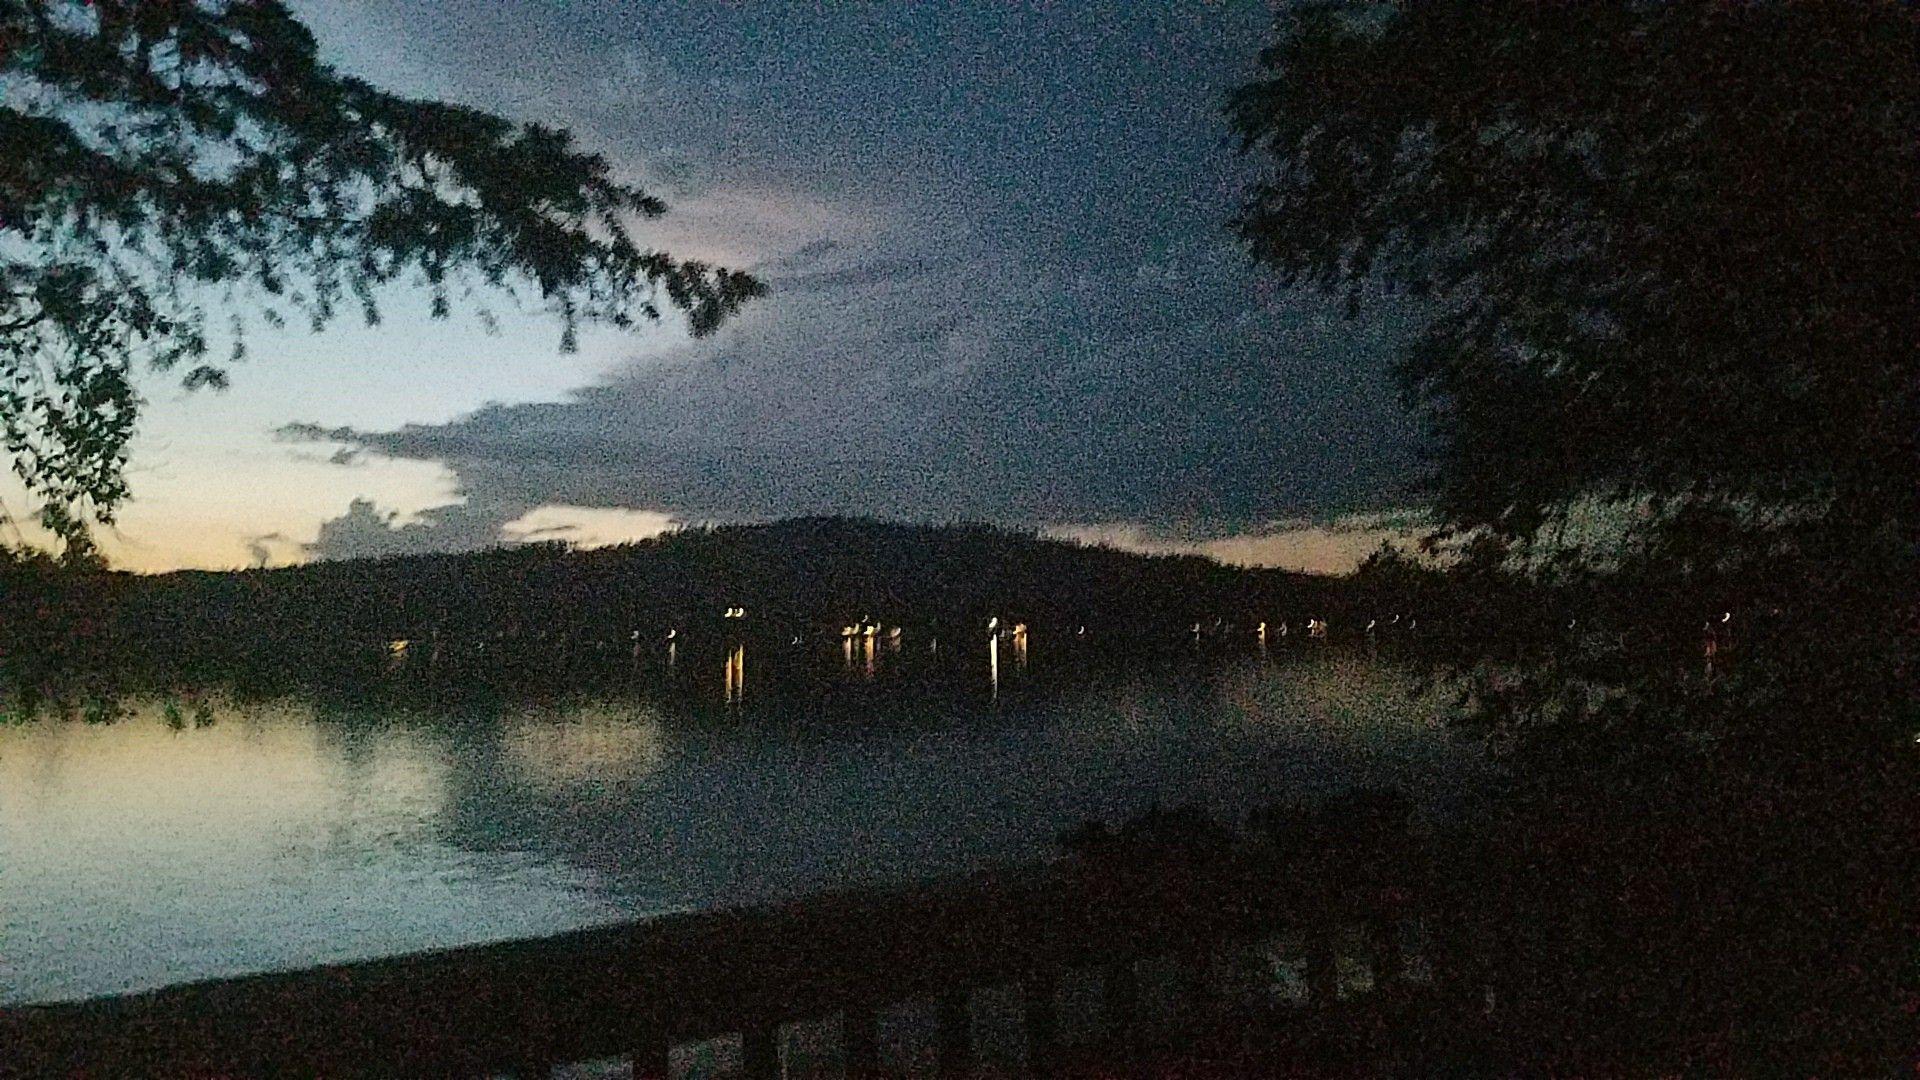 Diamond lake wa with images diamond lake lake outdoor